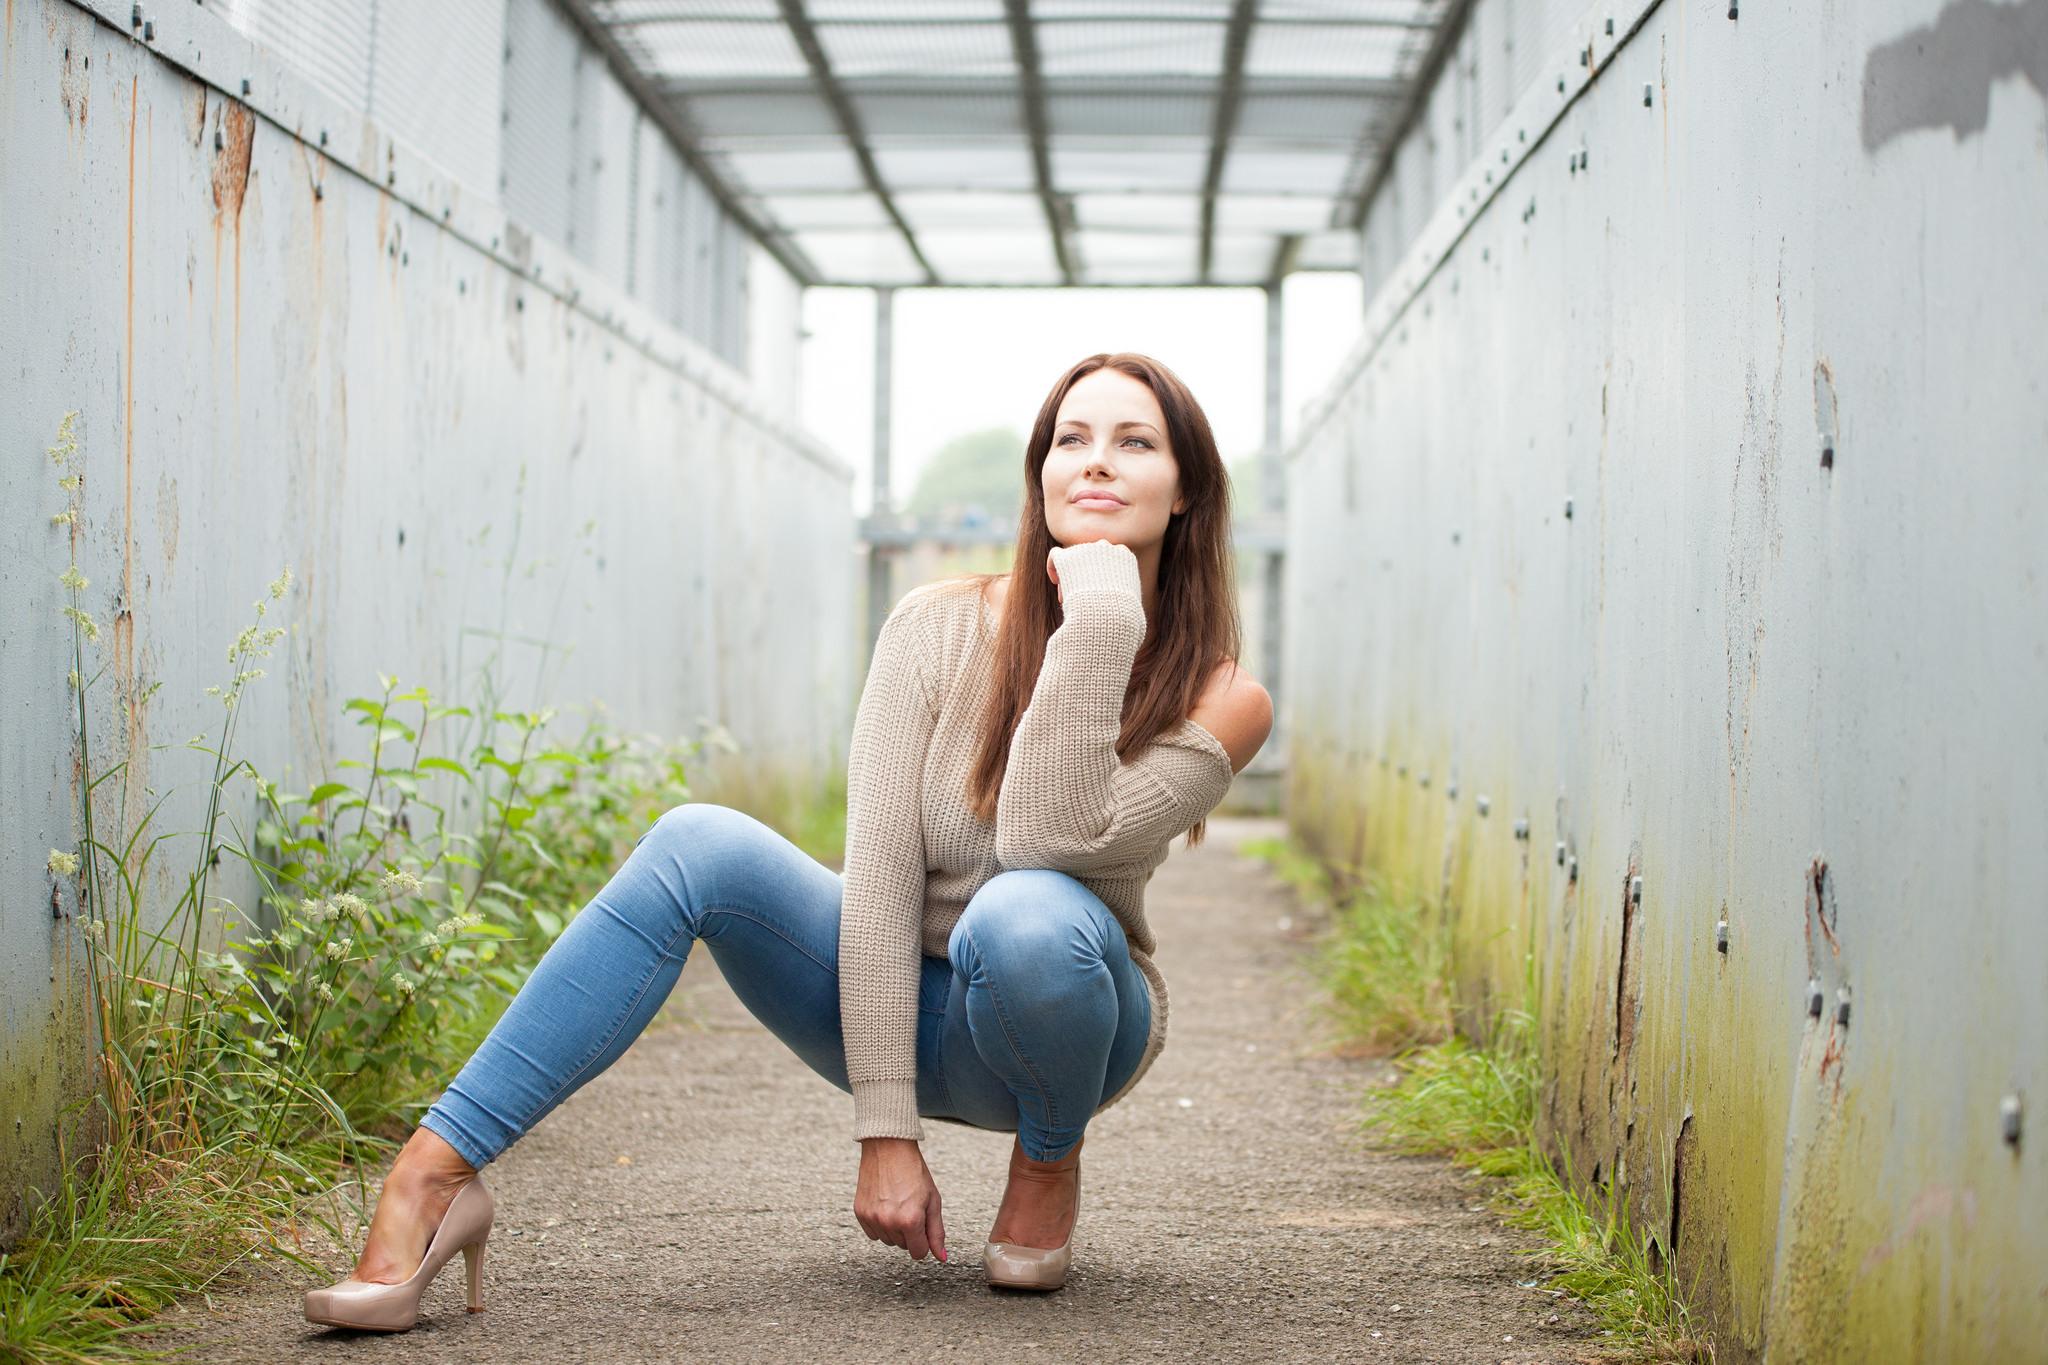 симпатичная девушка сидит на лице - 14